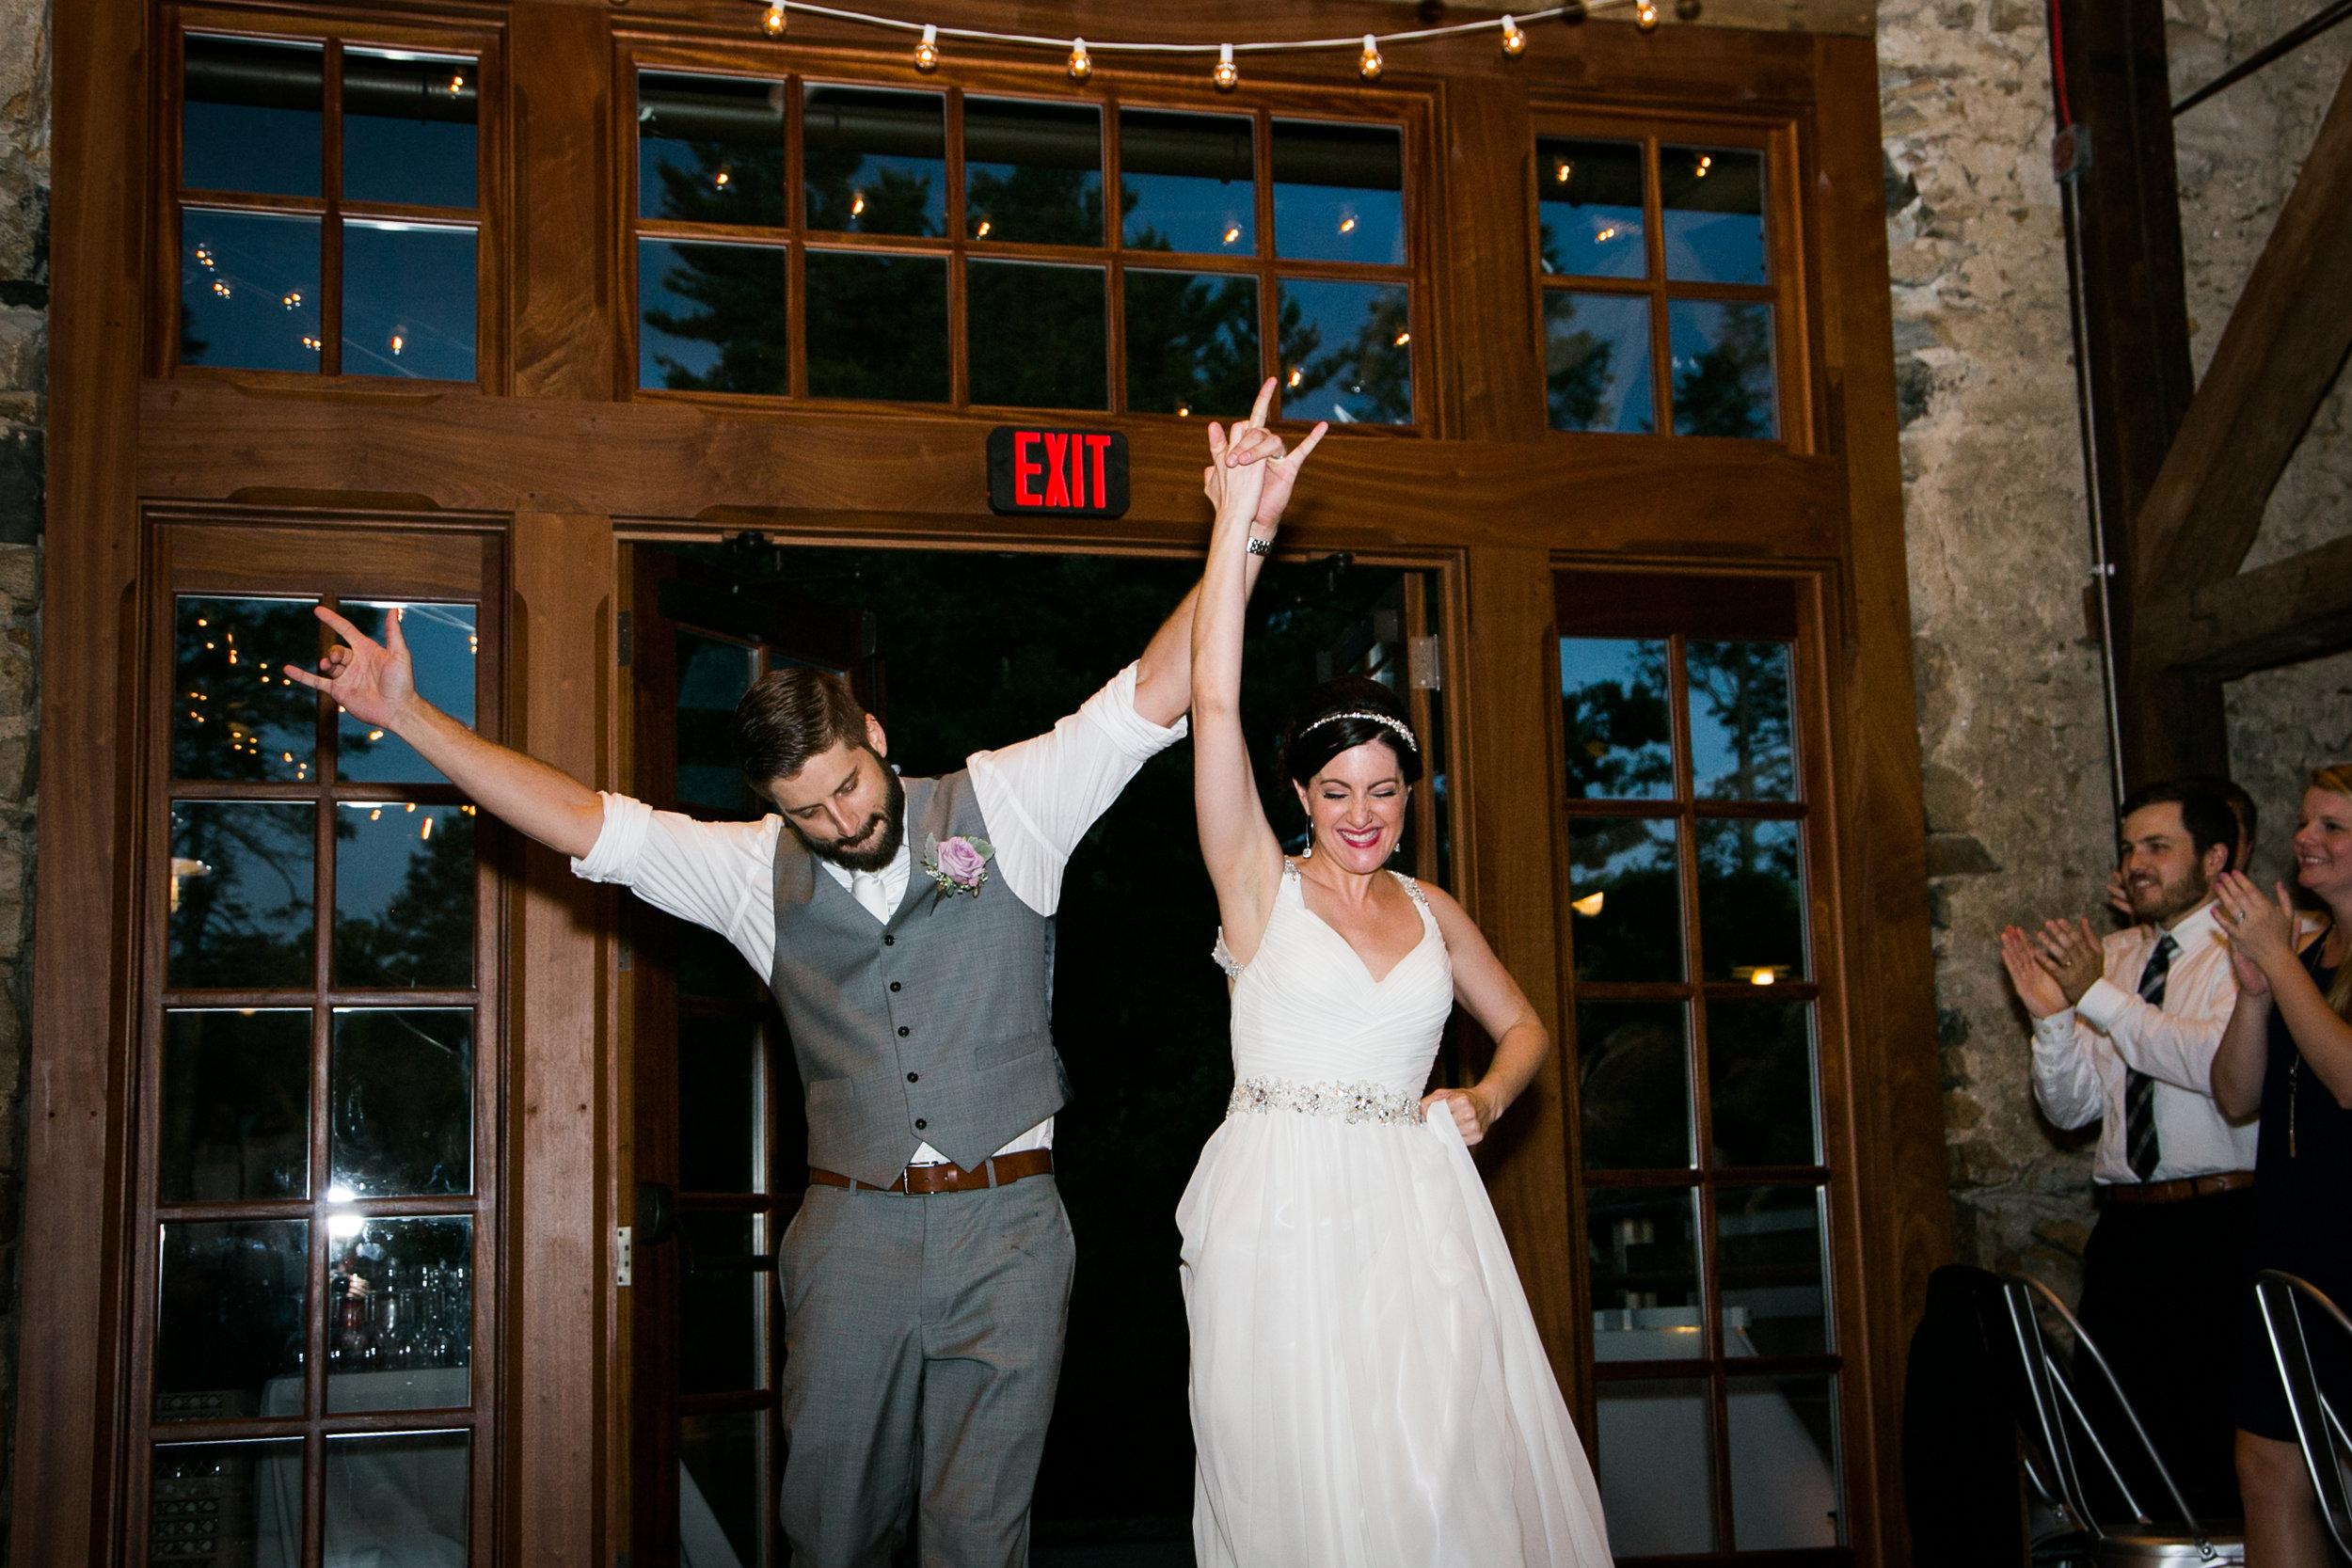 TYLER ARBORETUM WEDDING PHOTOGRAPHY LOVESTRUCK PICTURES-077.jpg